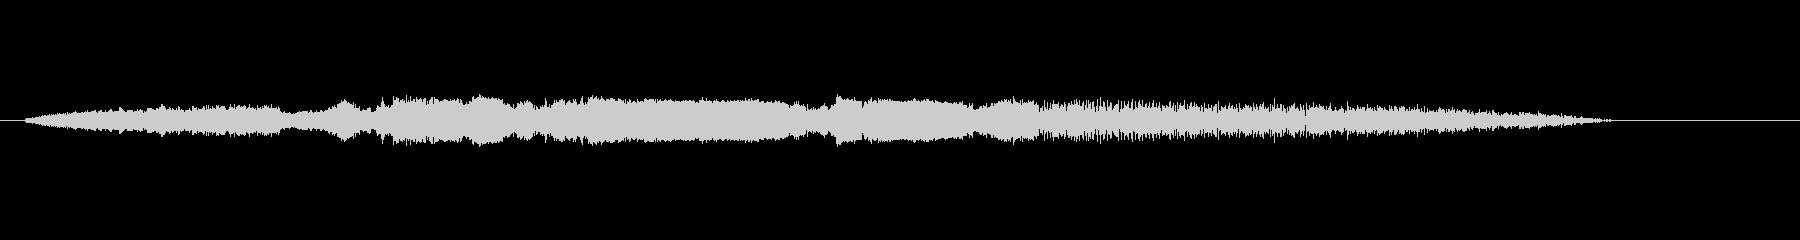 STUKA、PEEL OFF、WH...の未再生の波形